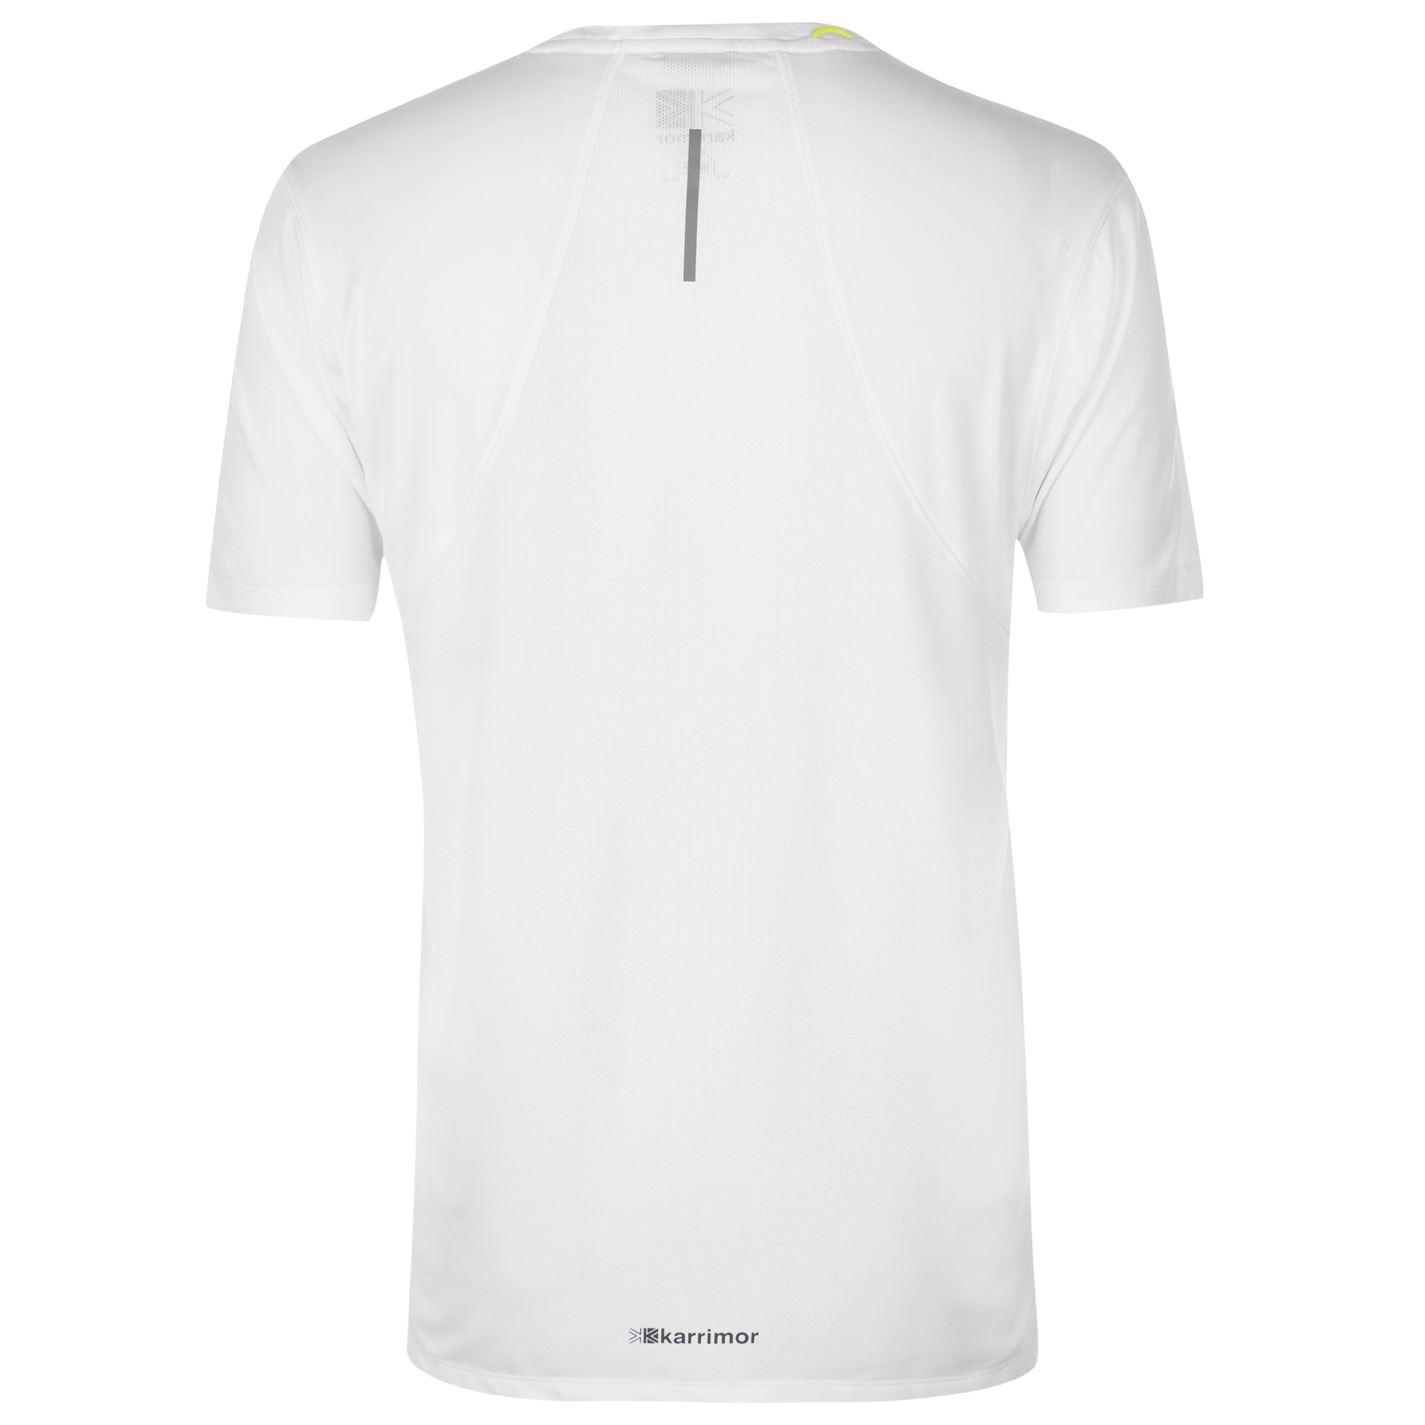 Karrimor-Hombres-X-Lite-Camiseta-mangas-cortas-de-carrera-Rendimiento-Camiseta-Top-Cuello-Redondo miniatura 25